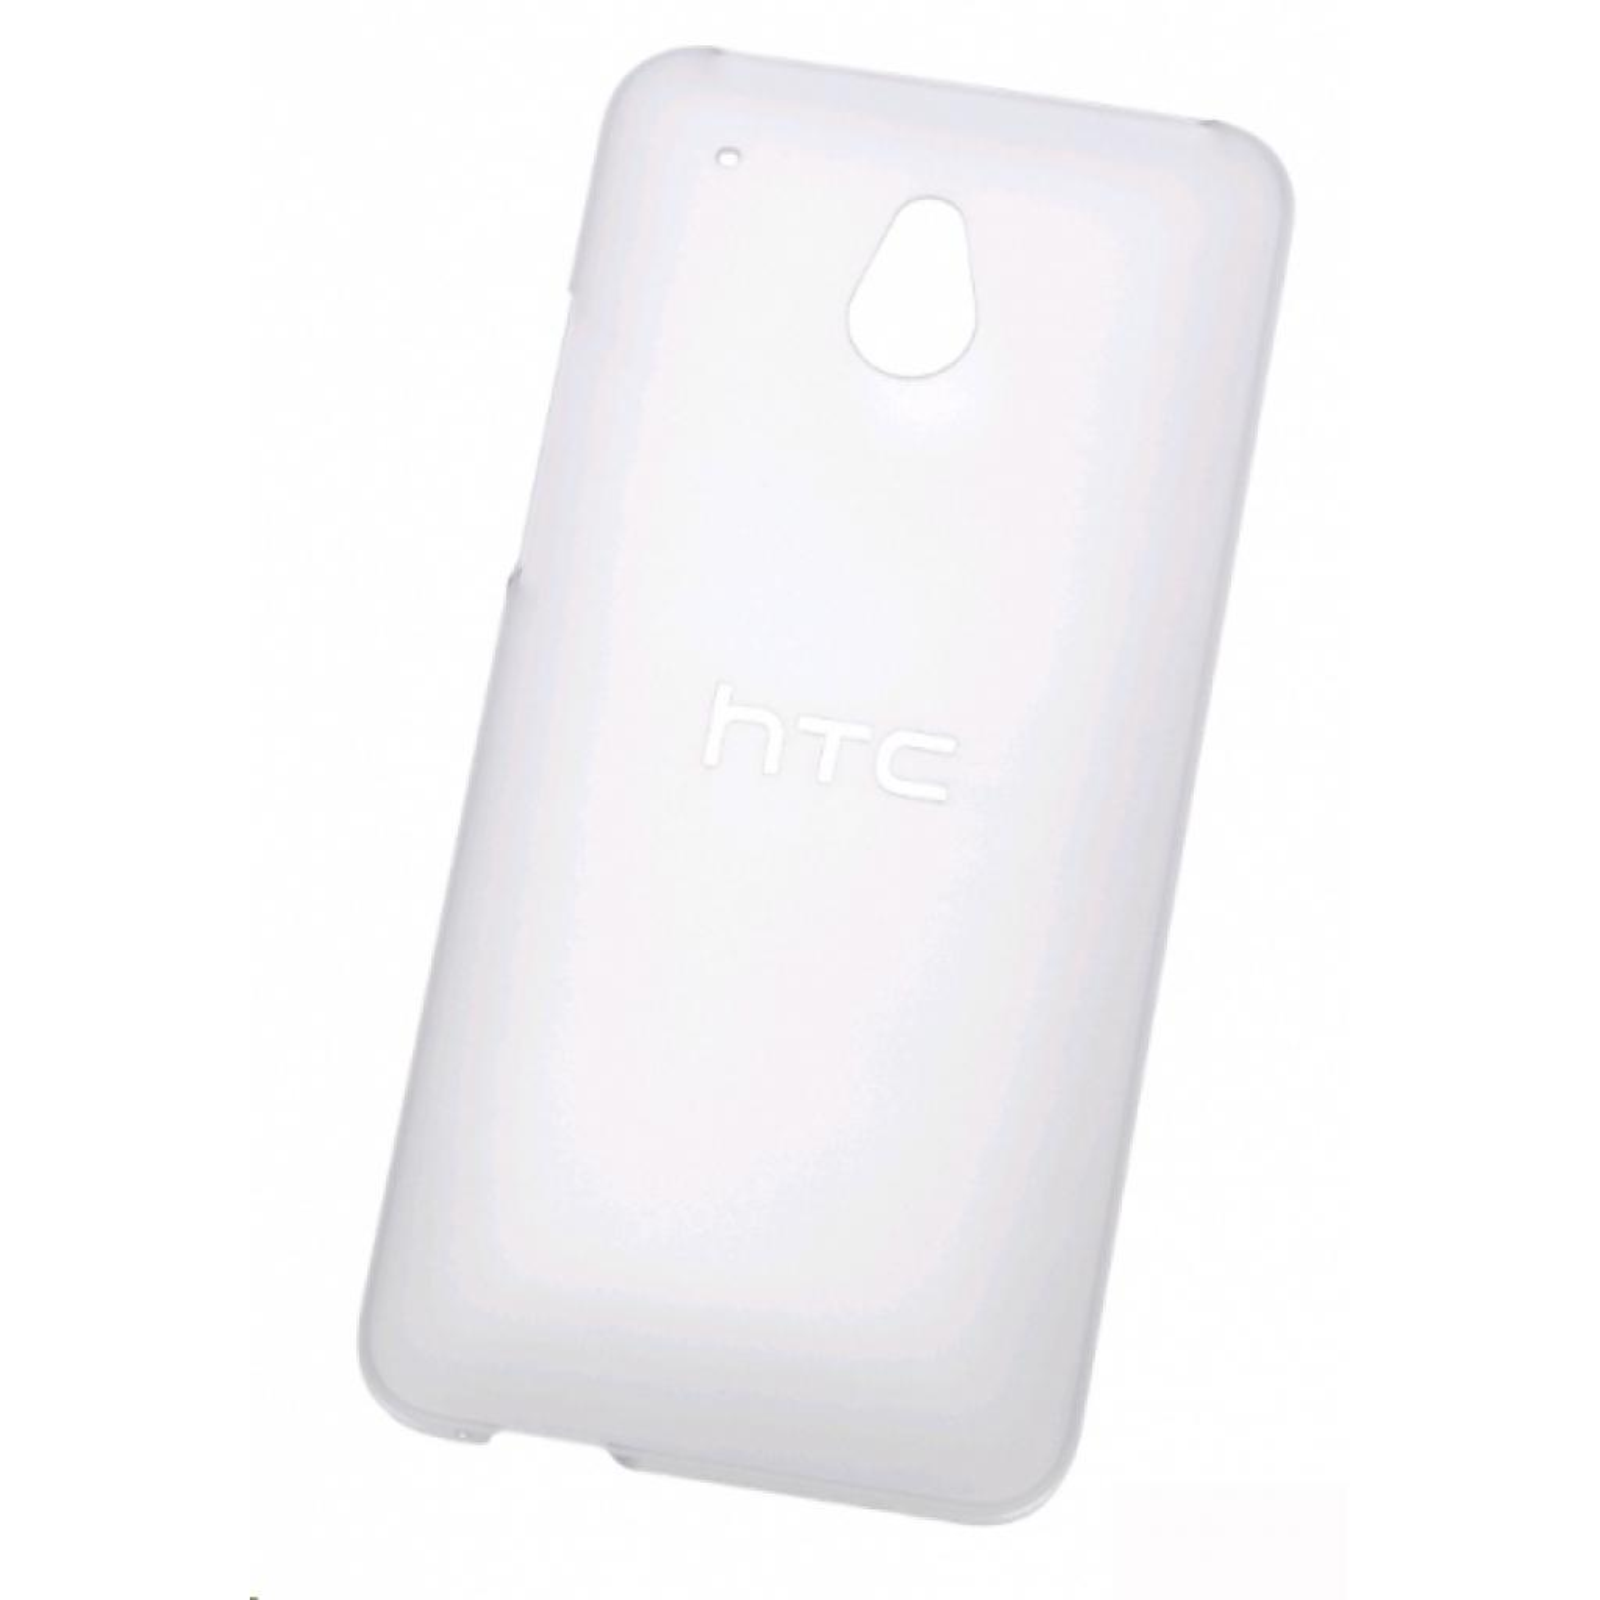 Чехол для моб. телефона HTC Desire 300 (HC C920) Clear (99H11323-00)